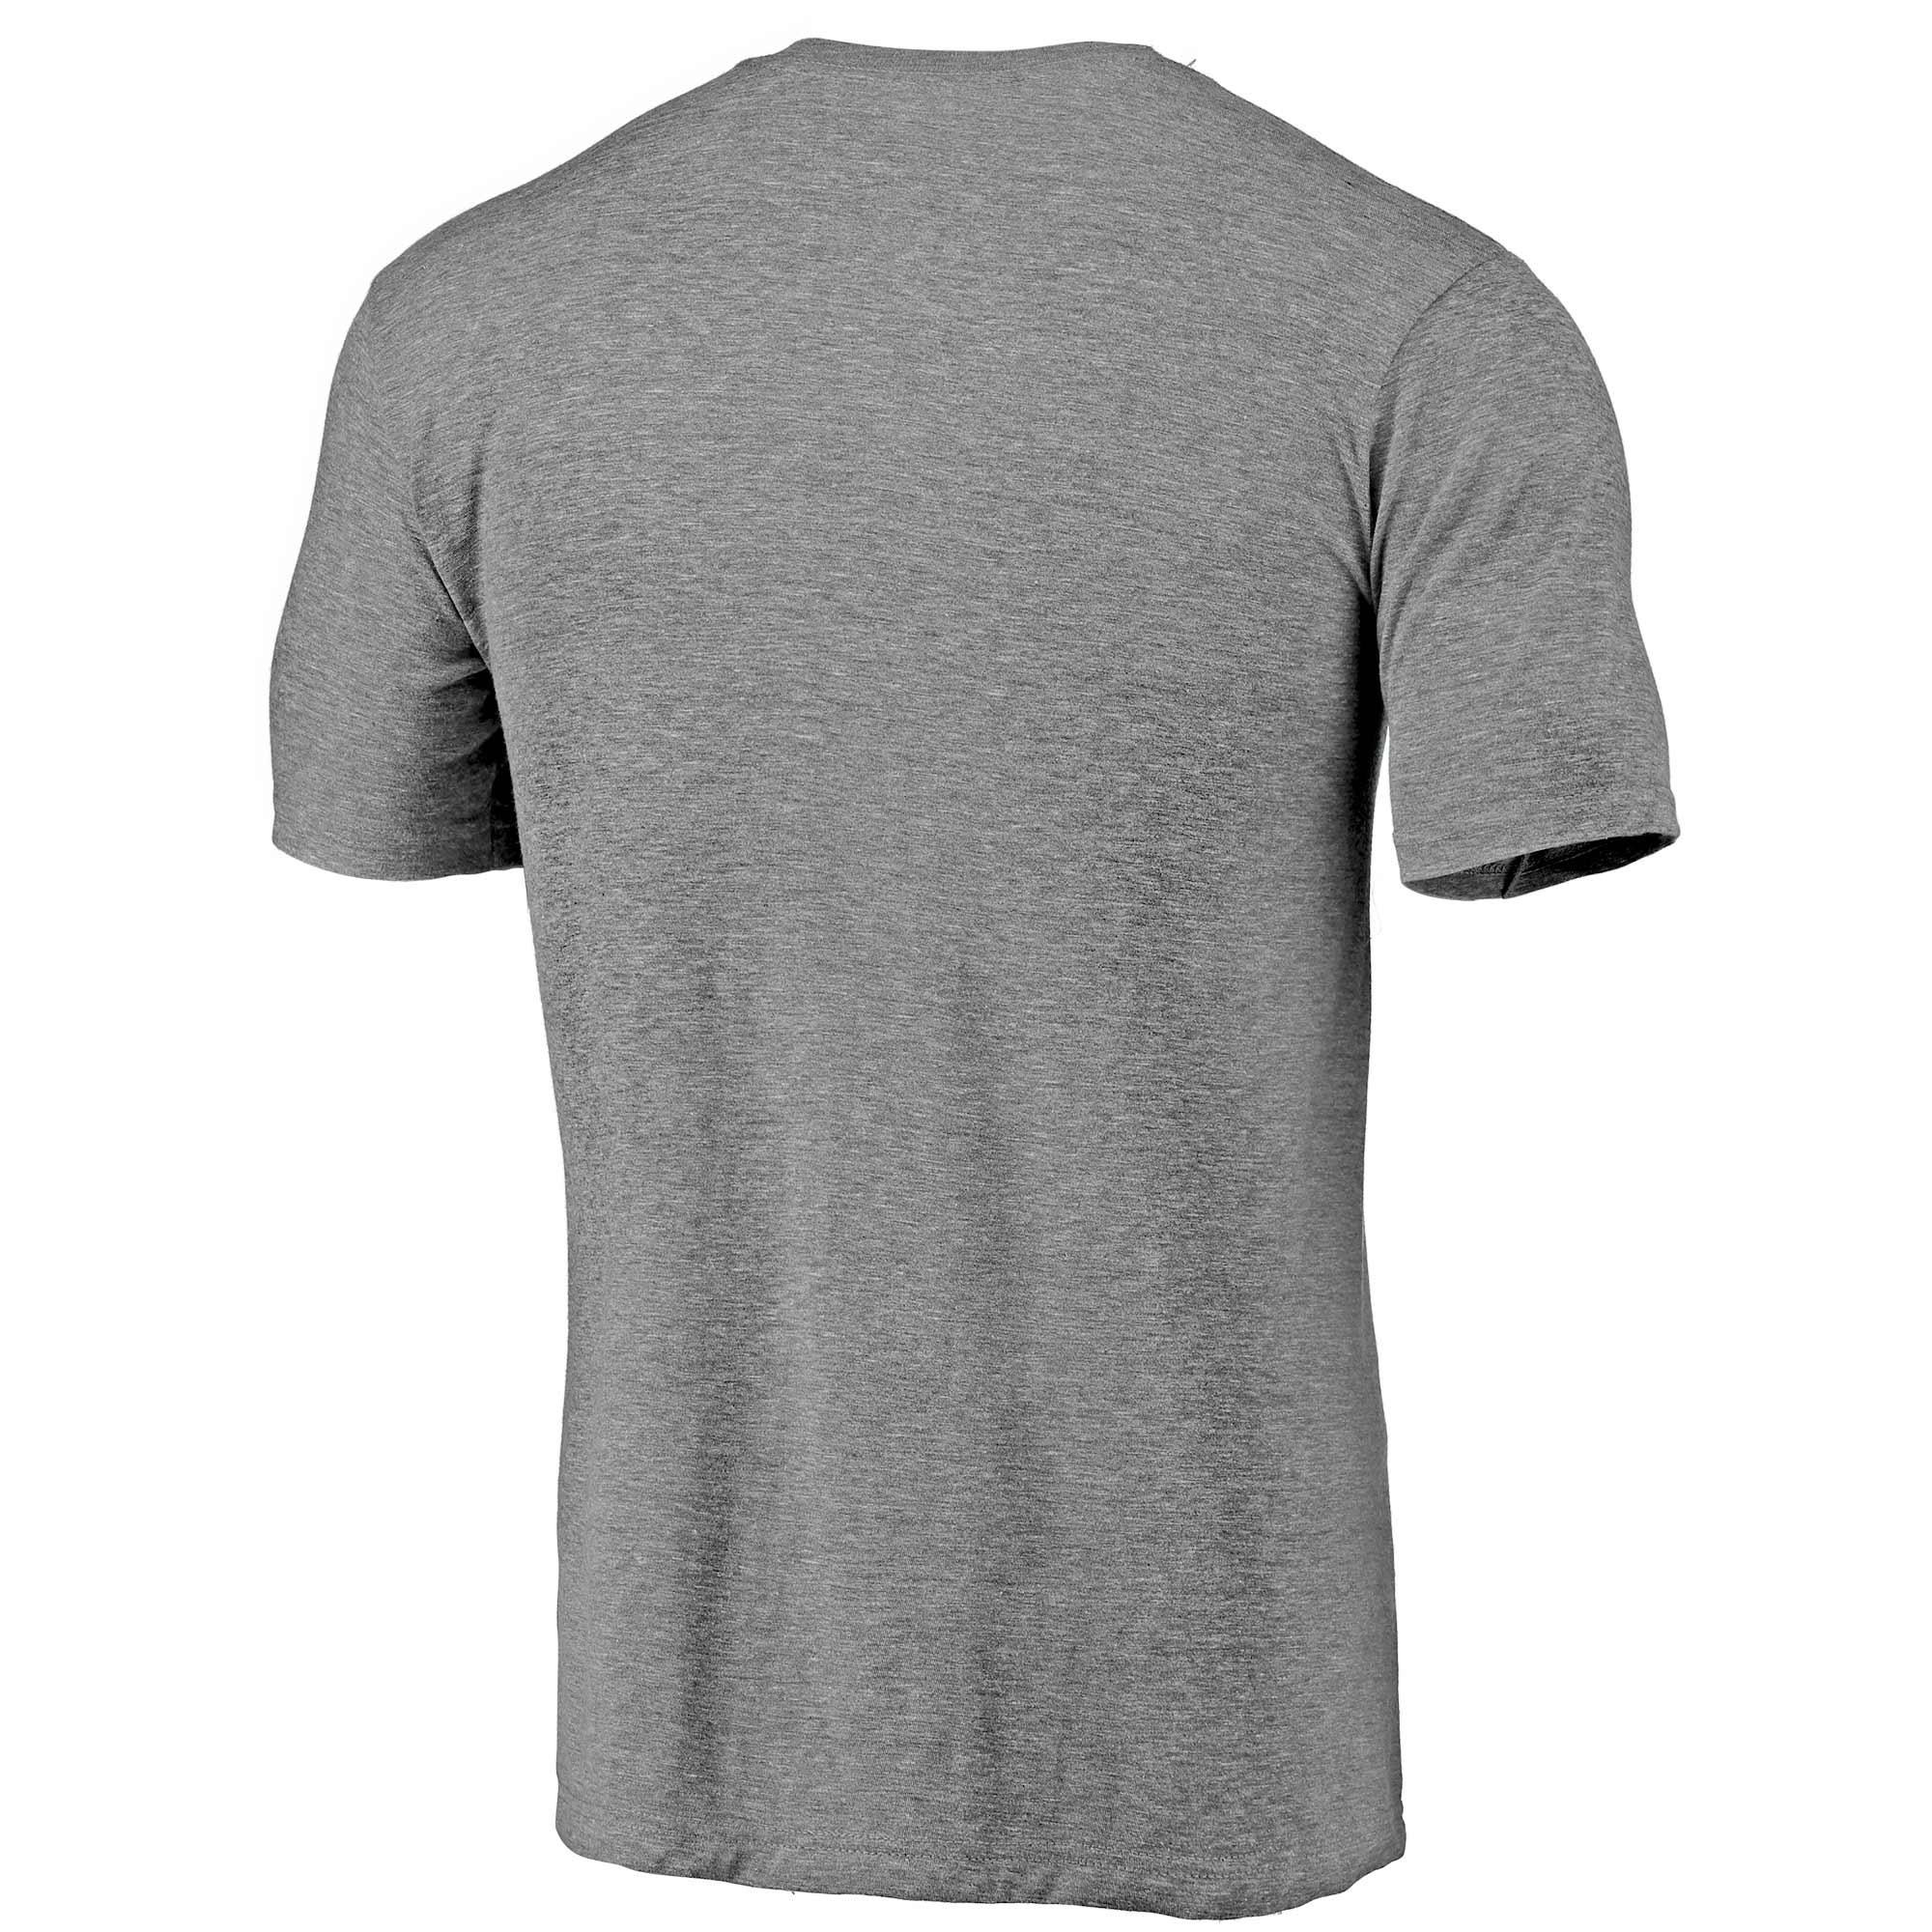 competitive price cbde7 8f0c2 Seattle Seahawks NFL Pro Line Throwback Logo Tri-Blend Short Sleeve T-Shirt  - Gray